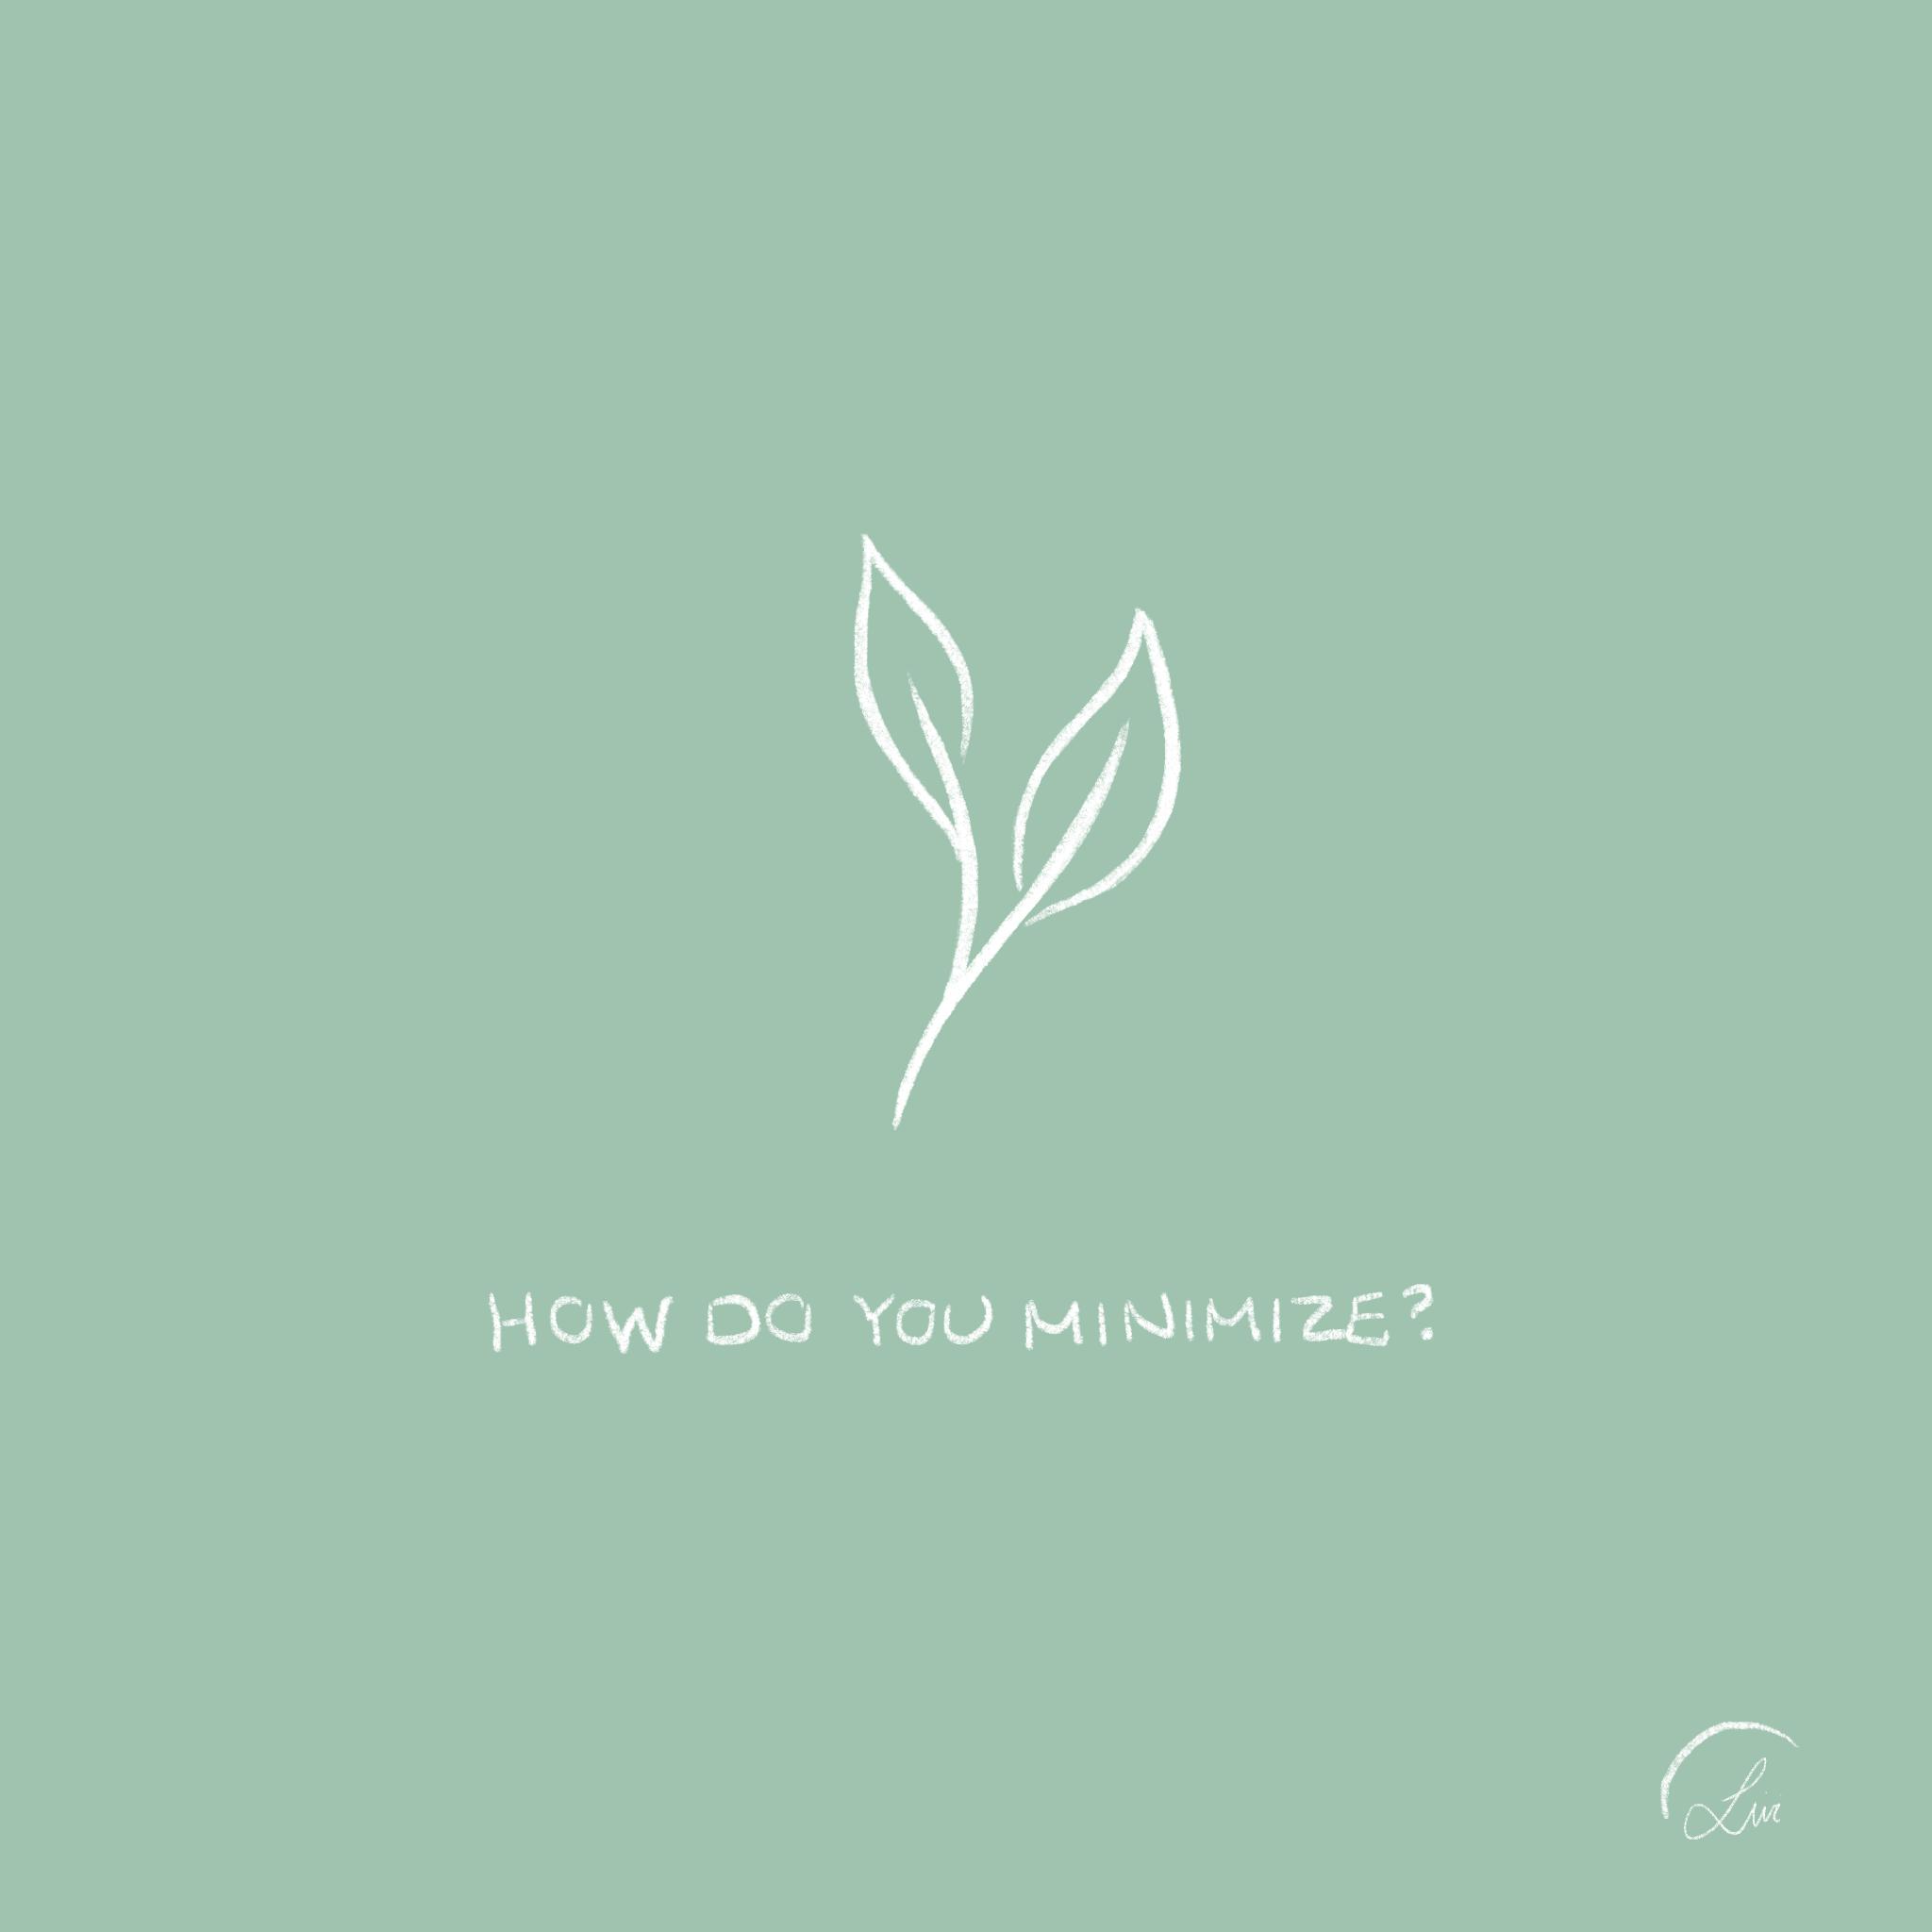 How do you minimize?